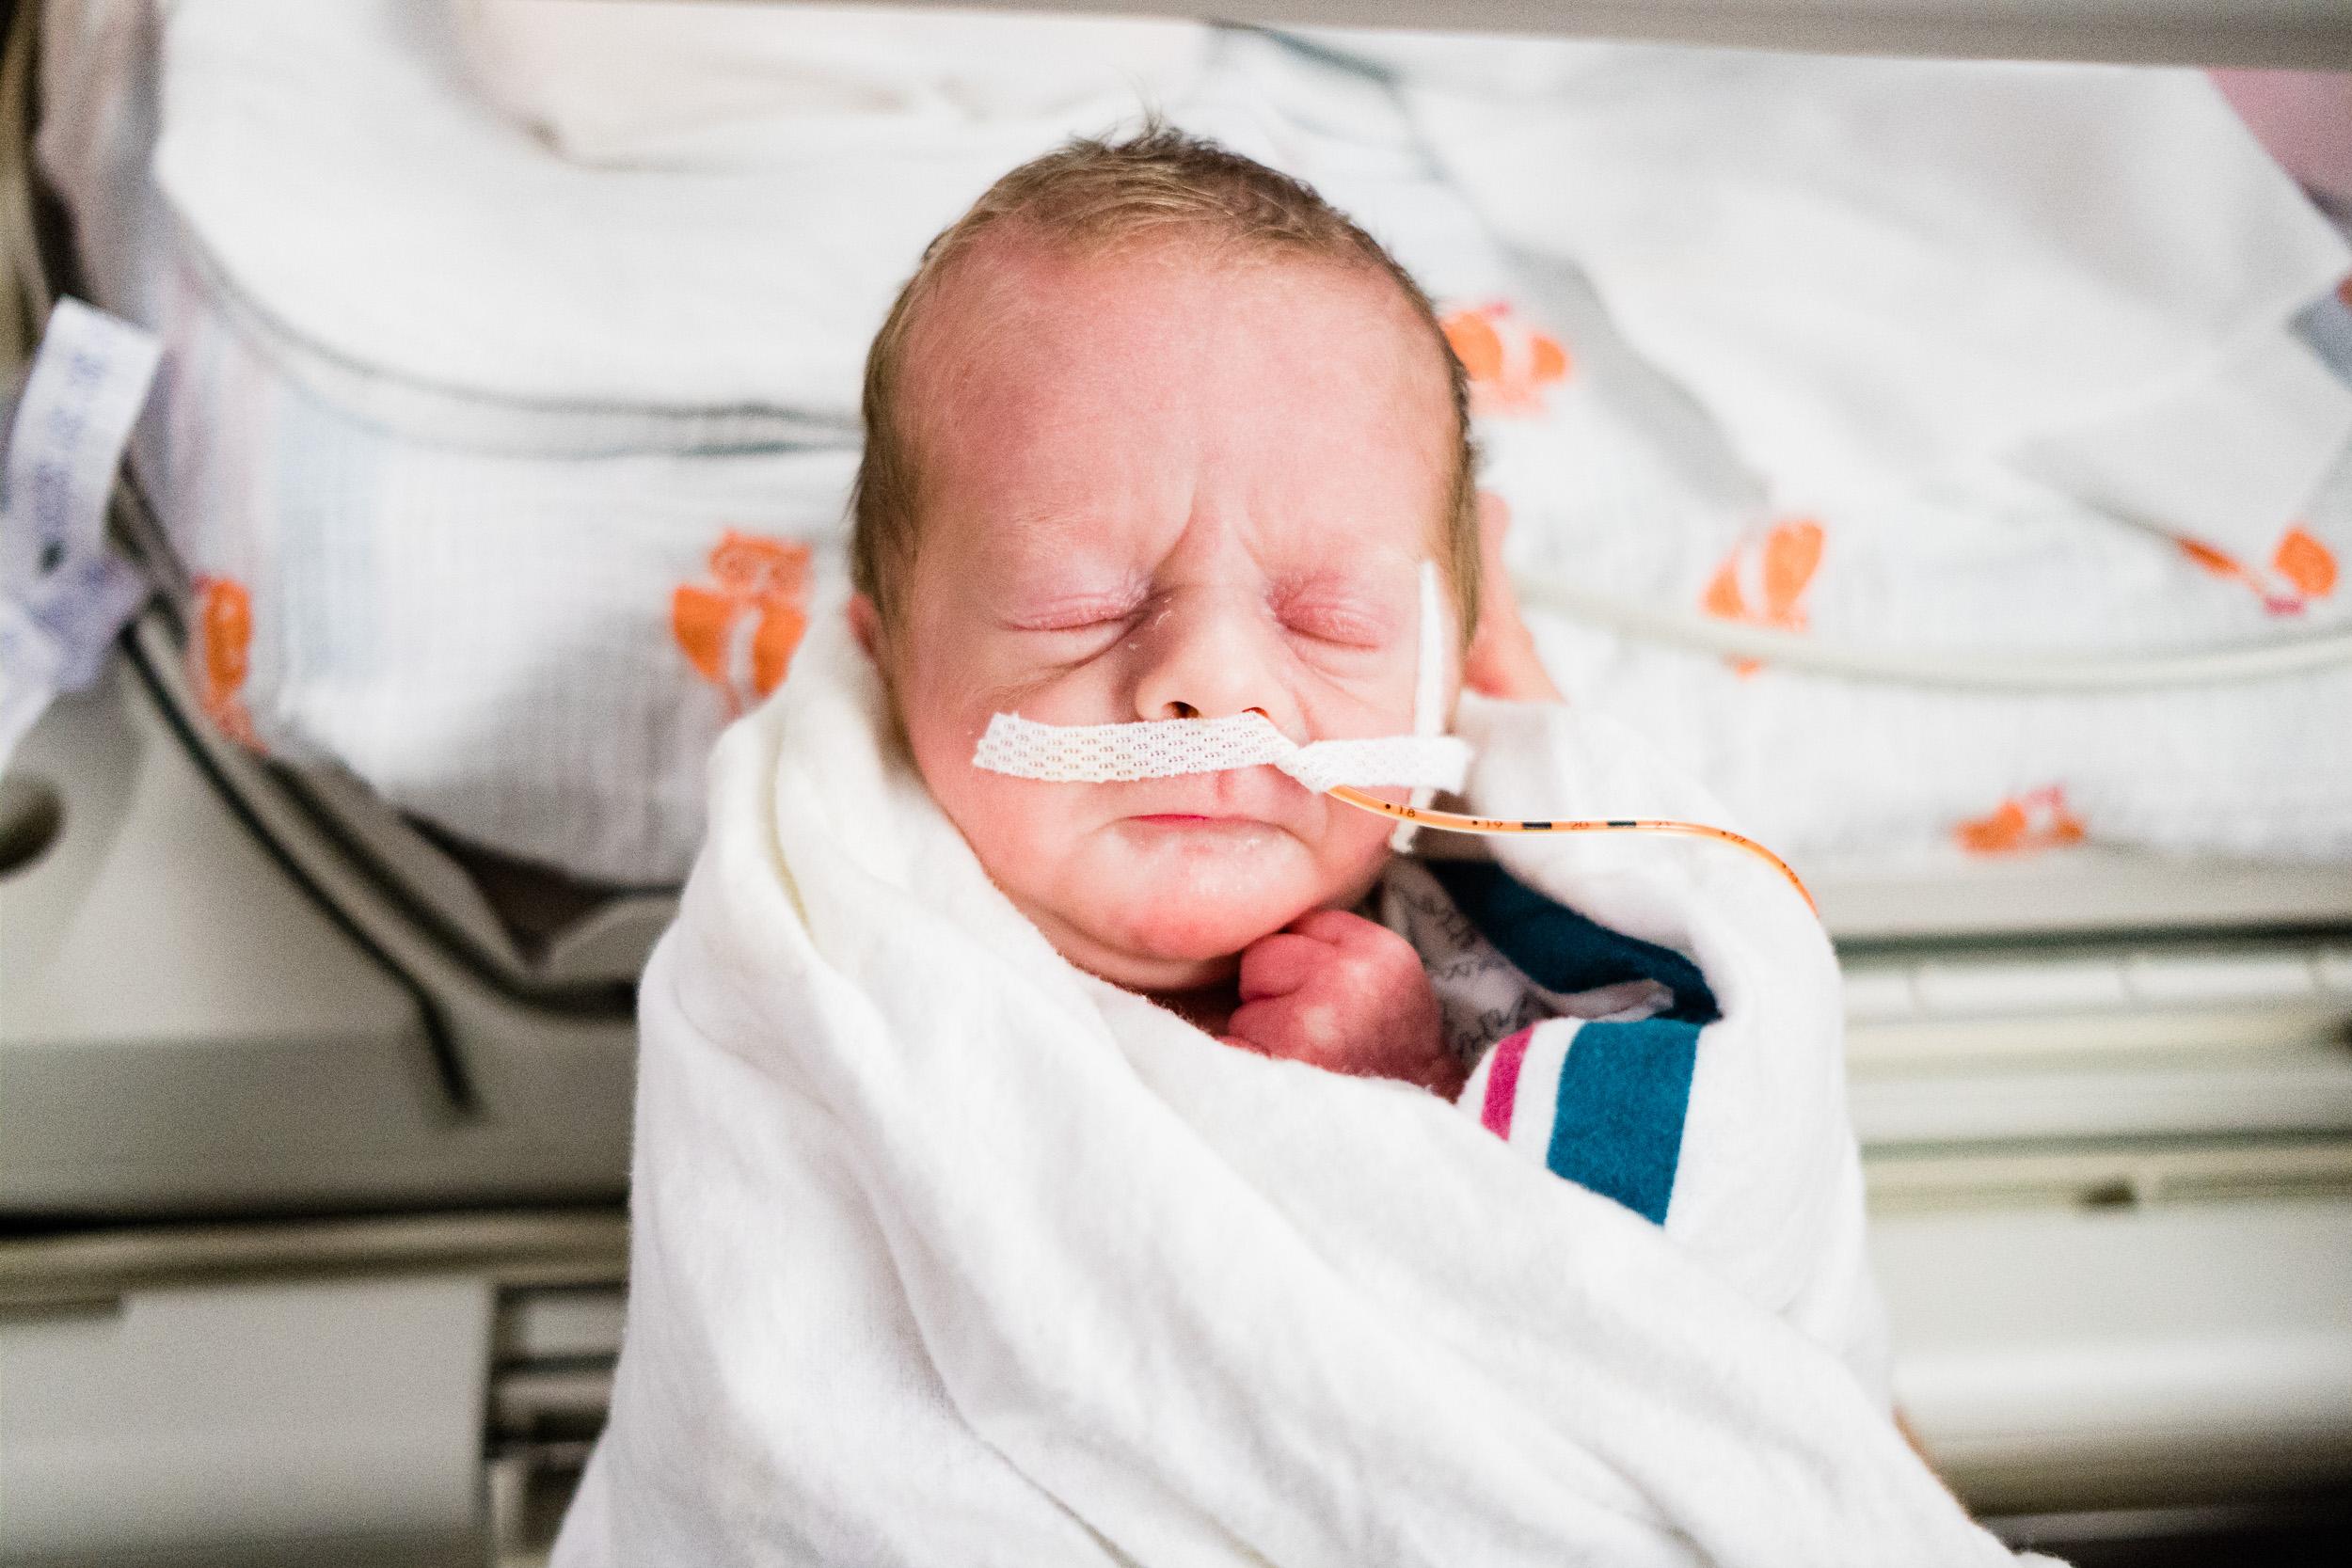 pensacola-nicu-premature-birth